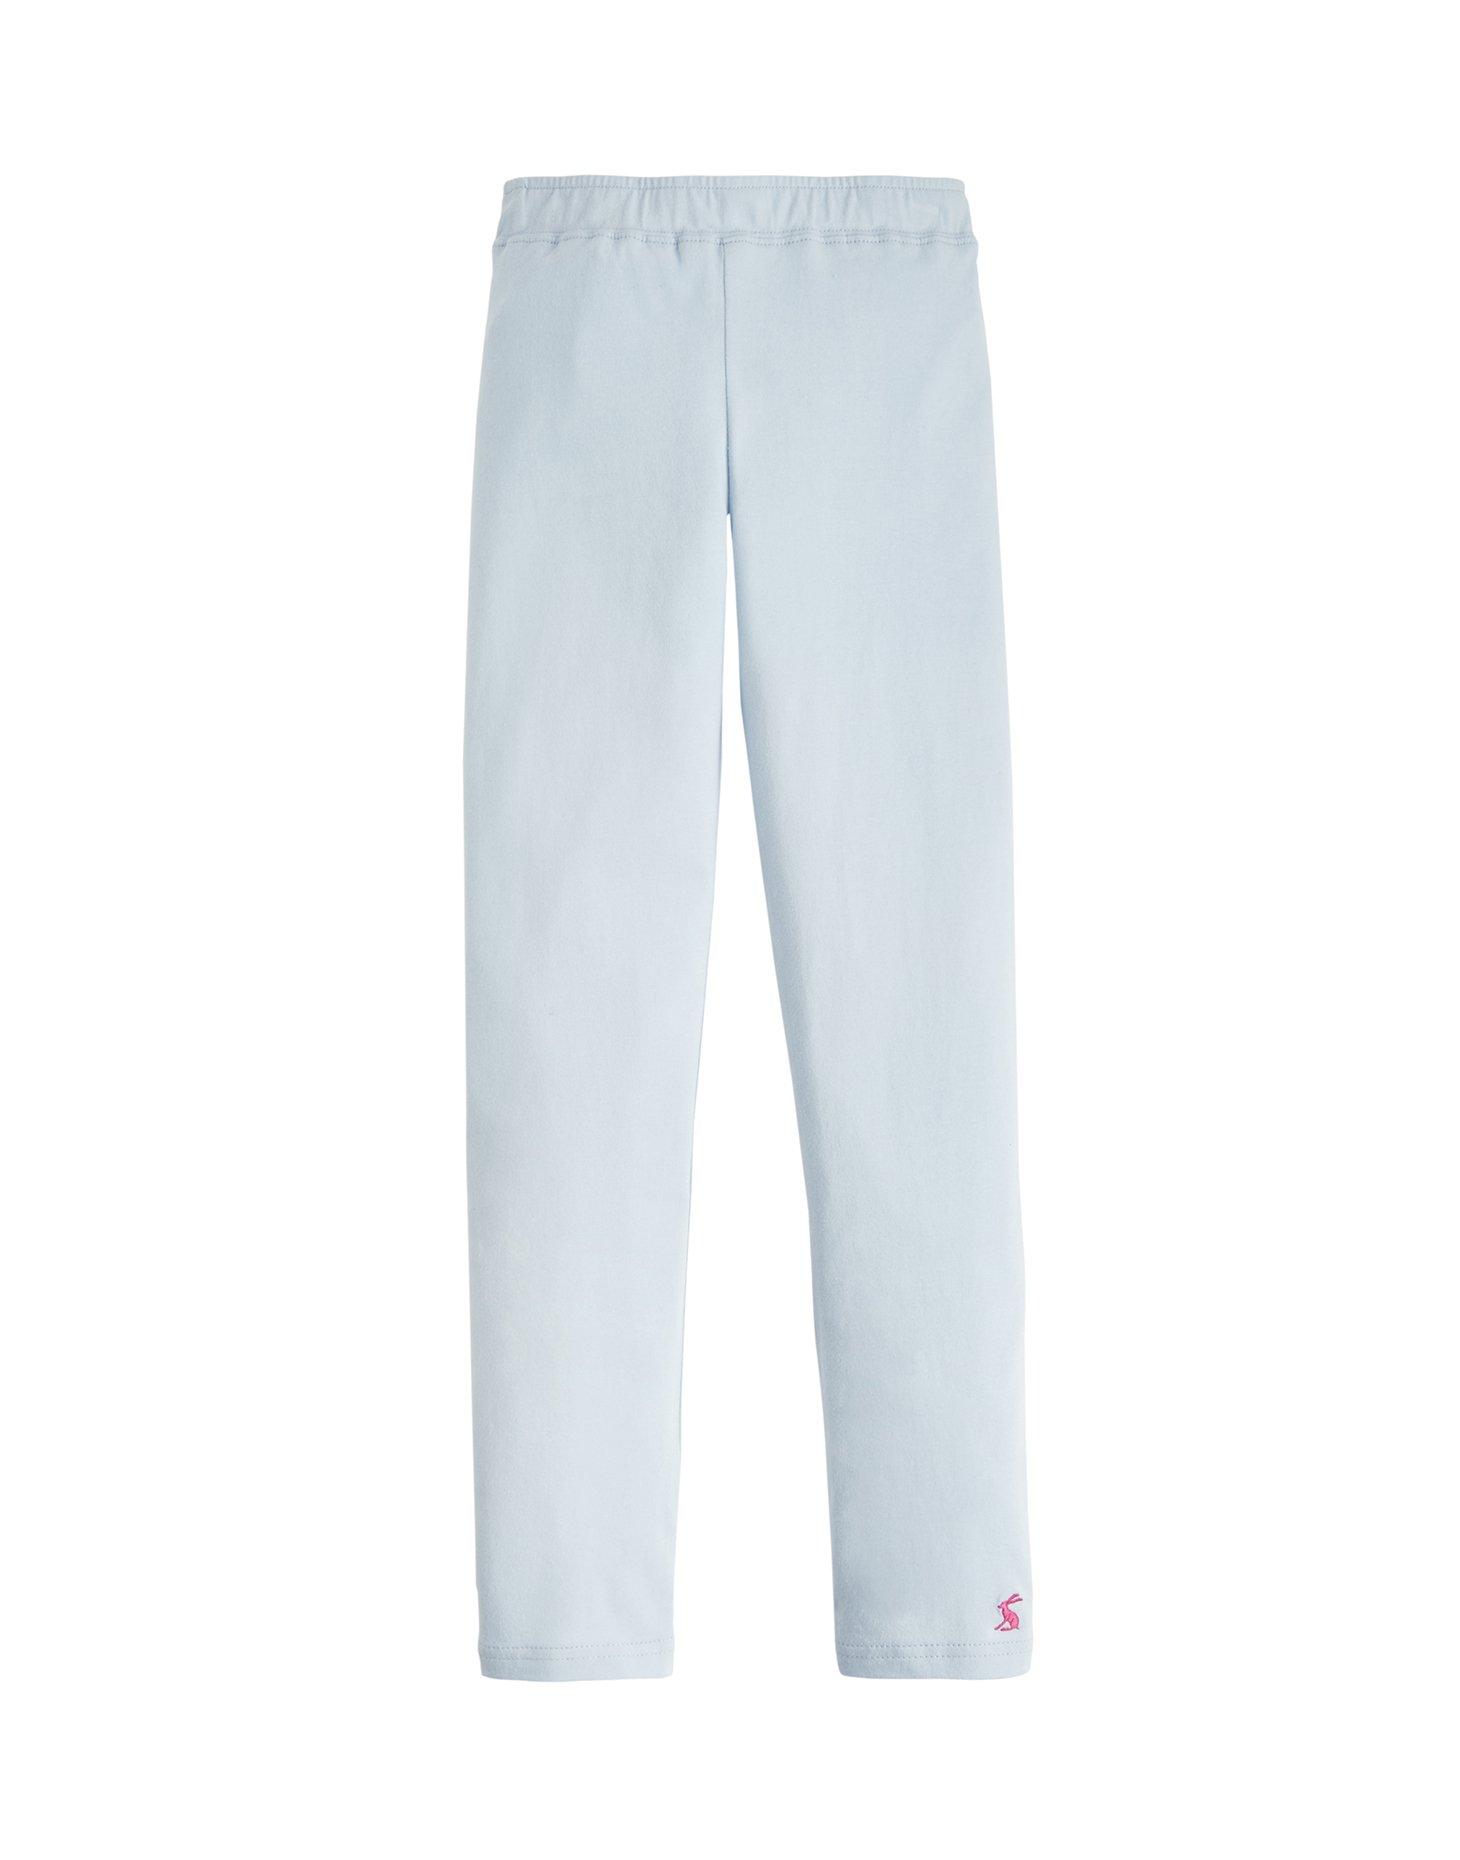 Joules Emilia Jersey Leggings - Sky Blue - 7-8 Years - 128 cm